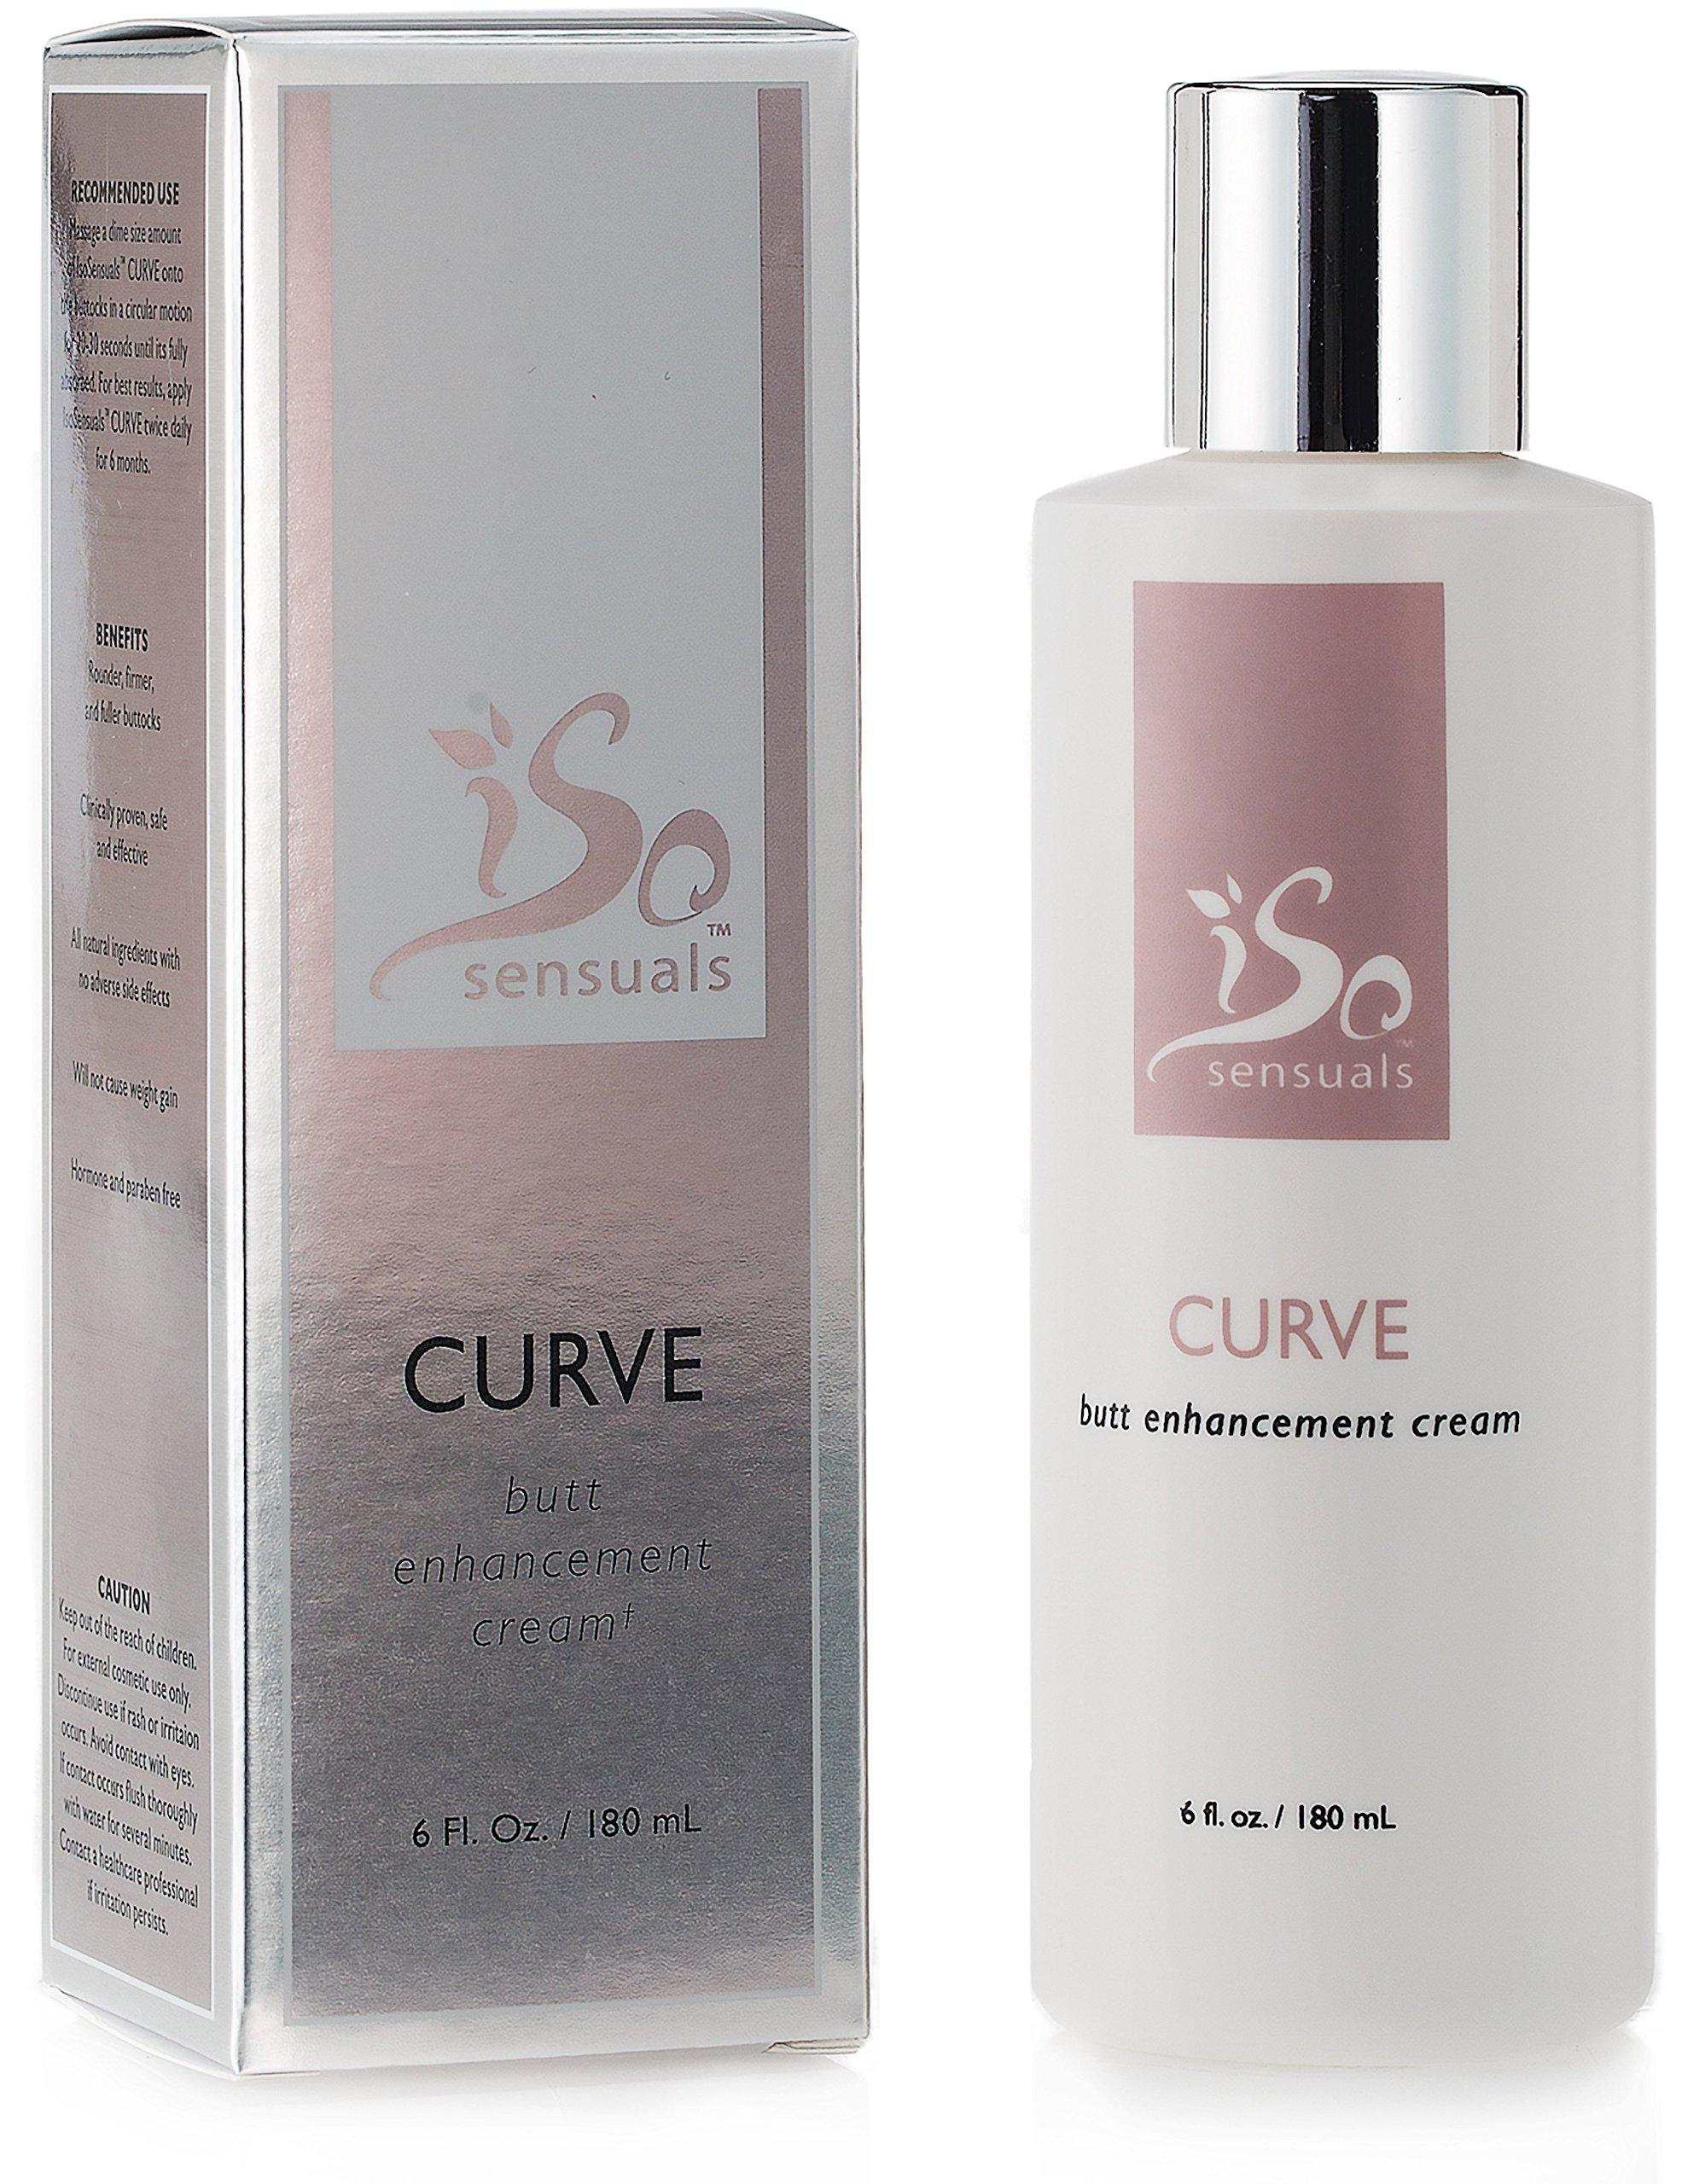 IsoSensuals CURVE | Butt Enhancement Cream - 1 Bottle | 2 Month Supply